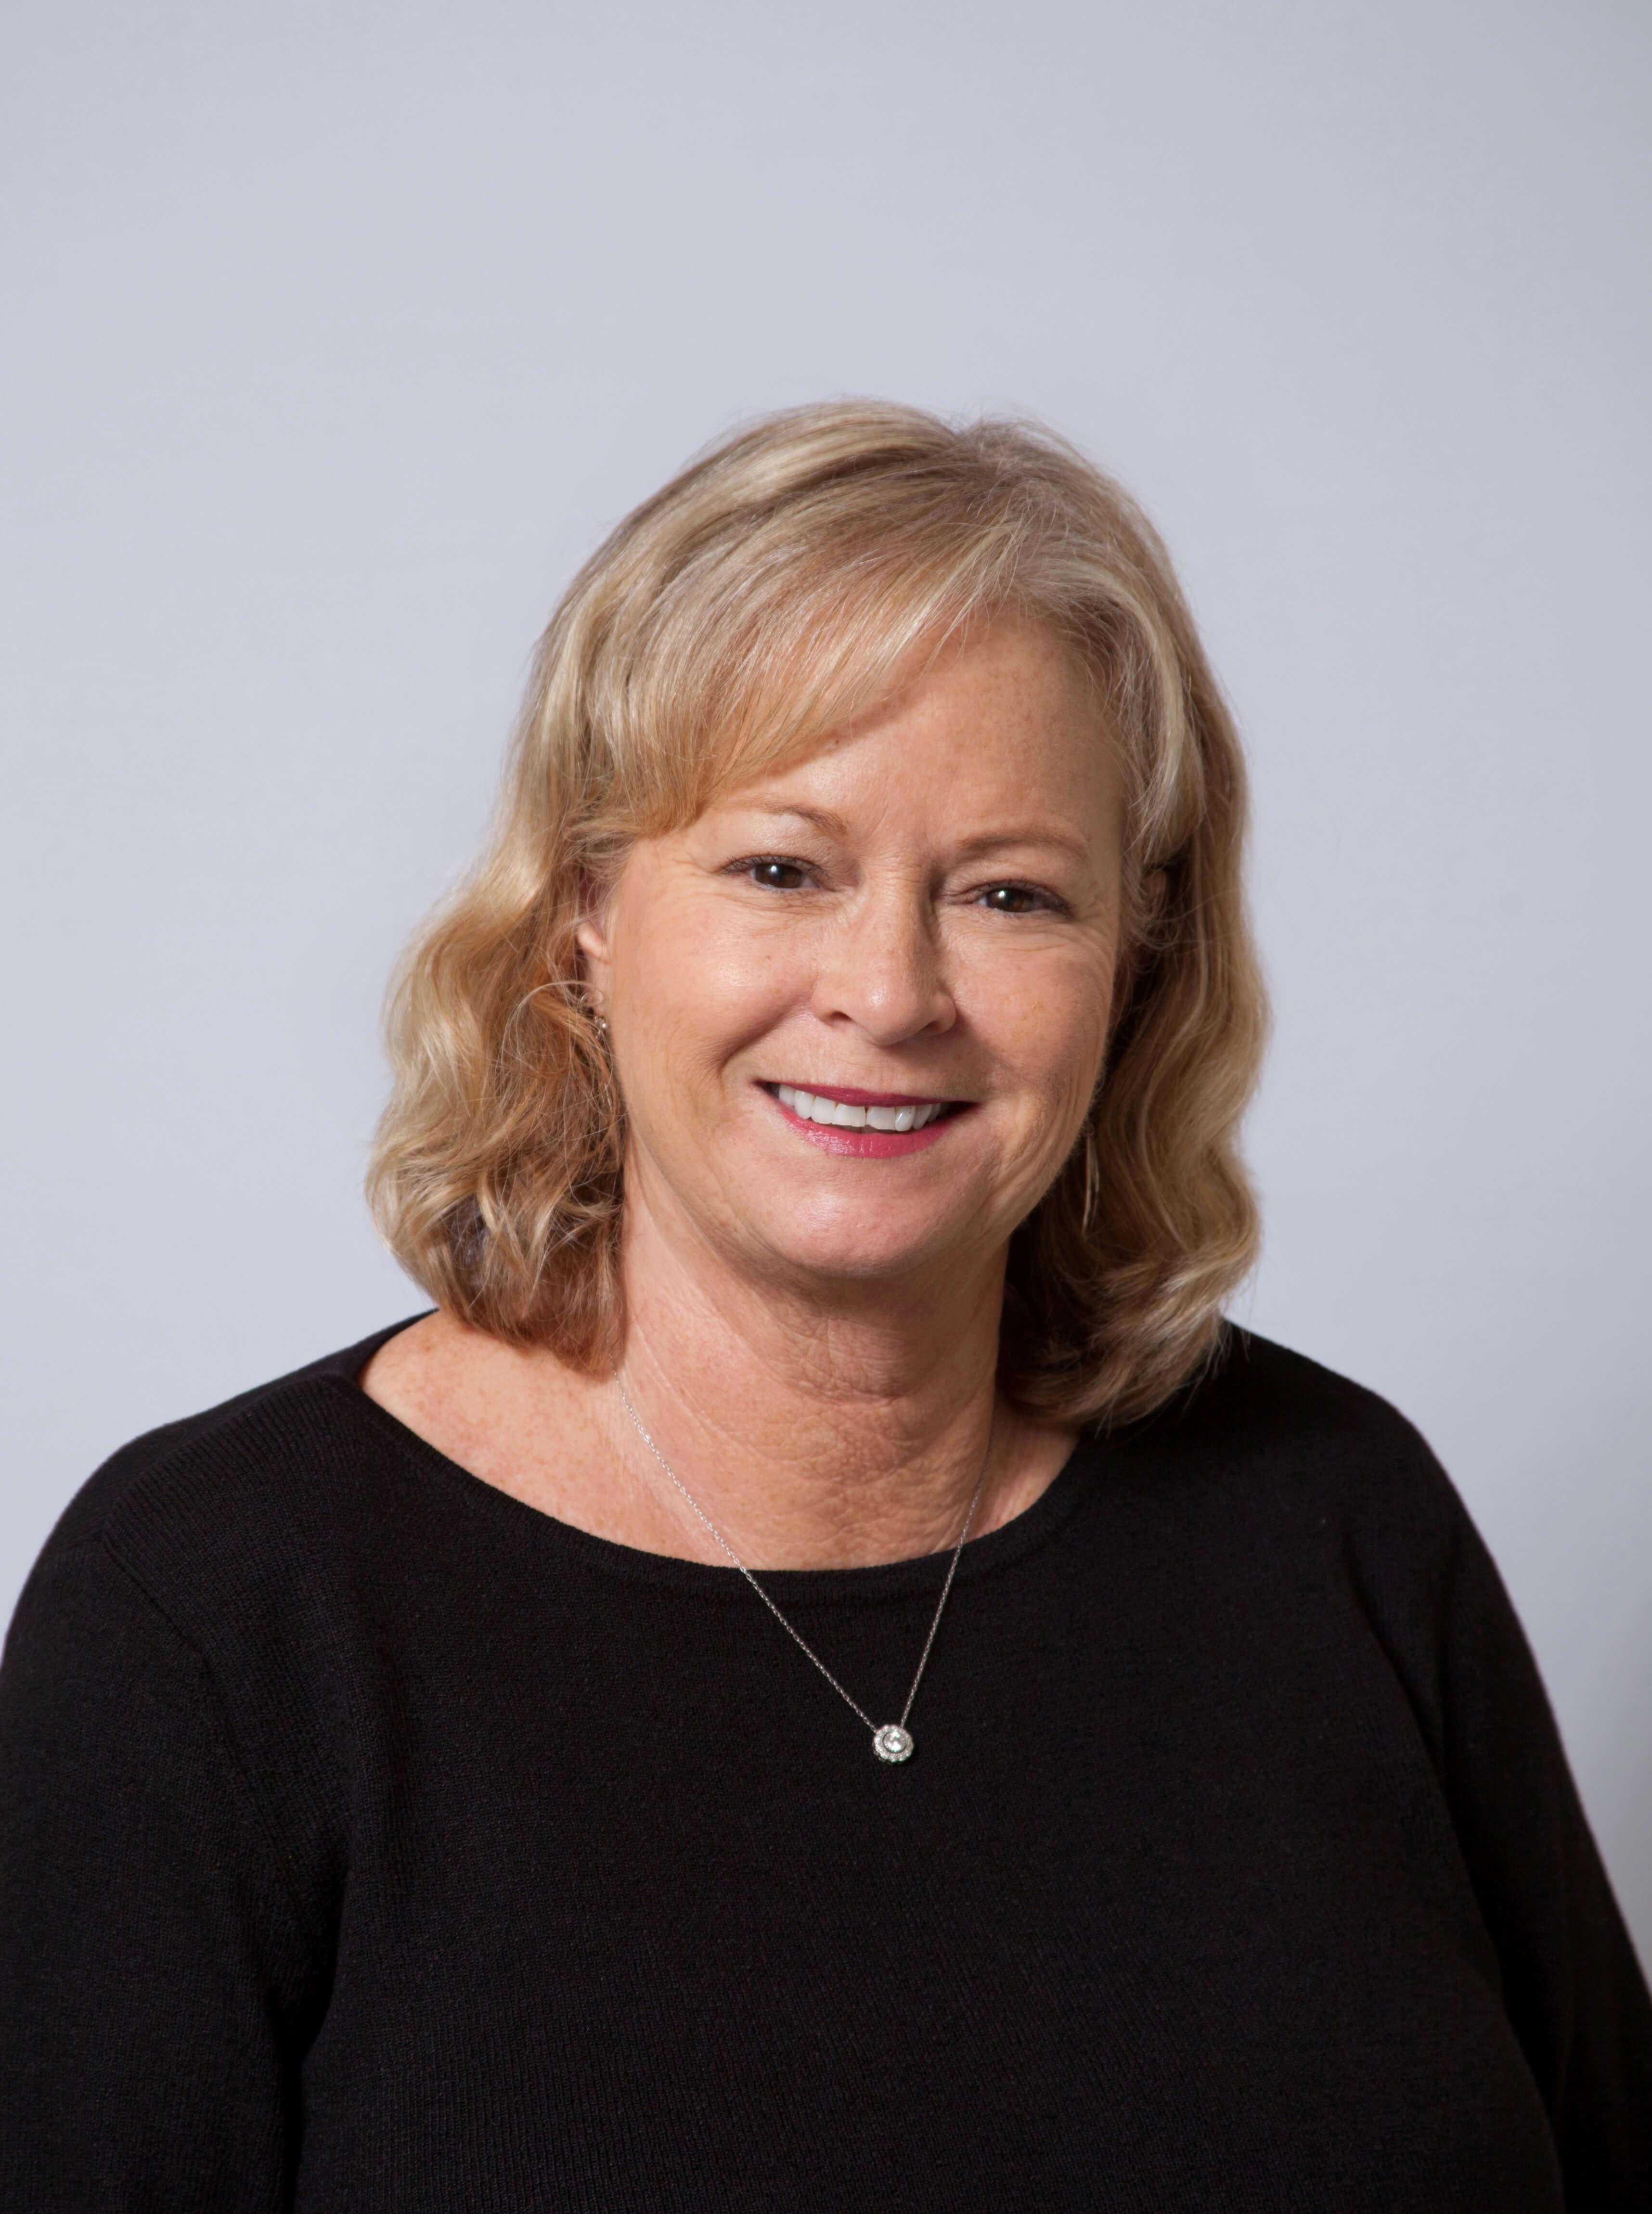 Denise Patrick